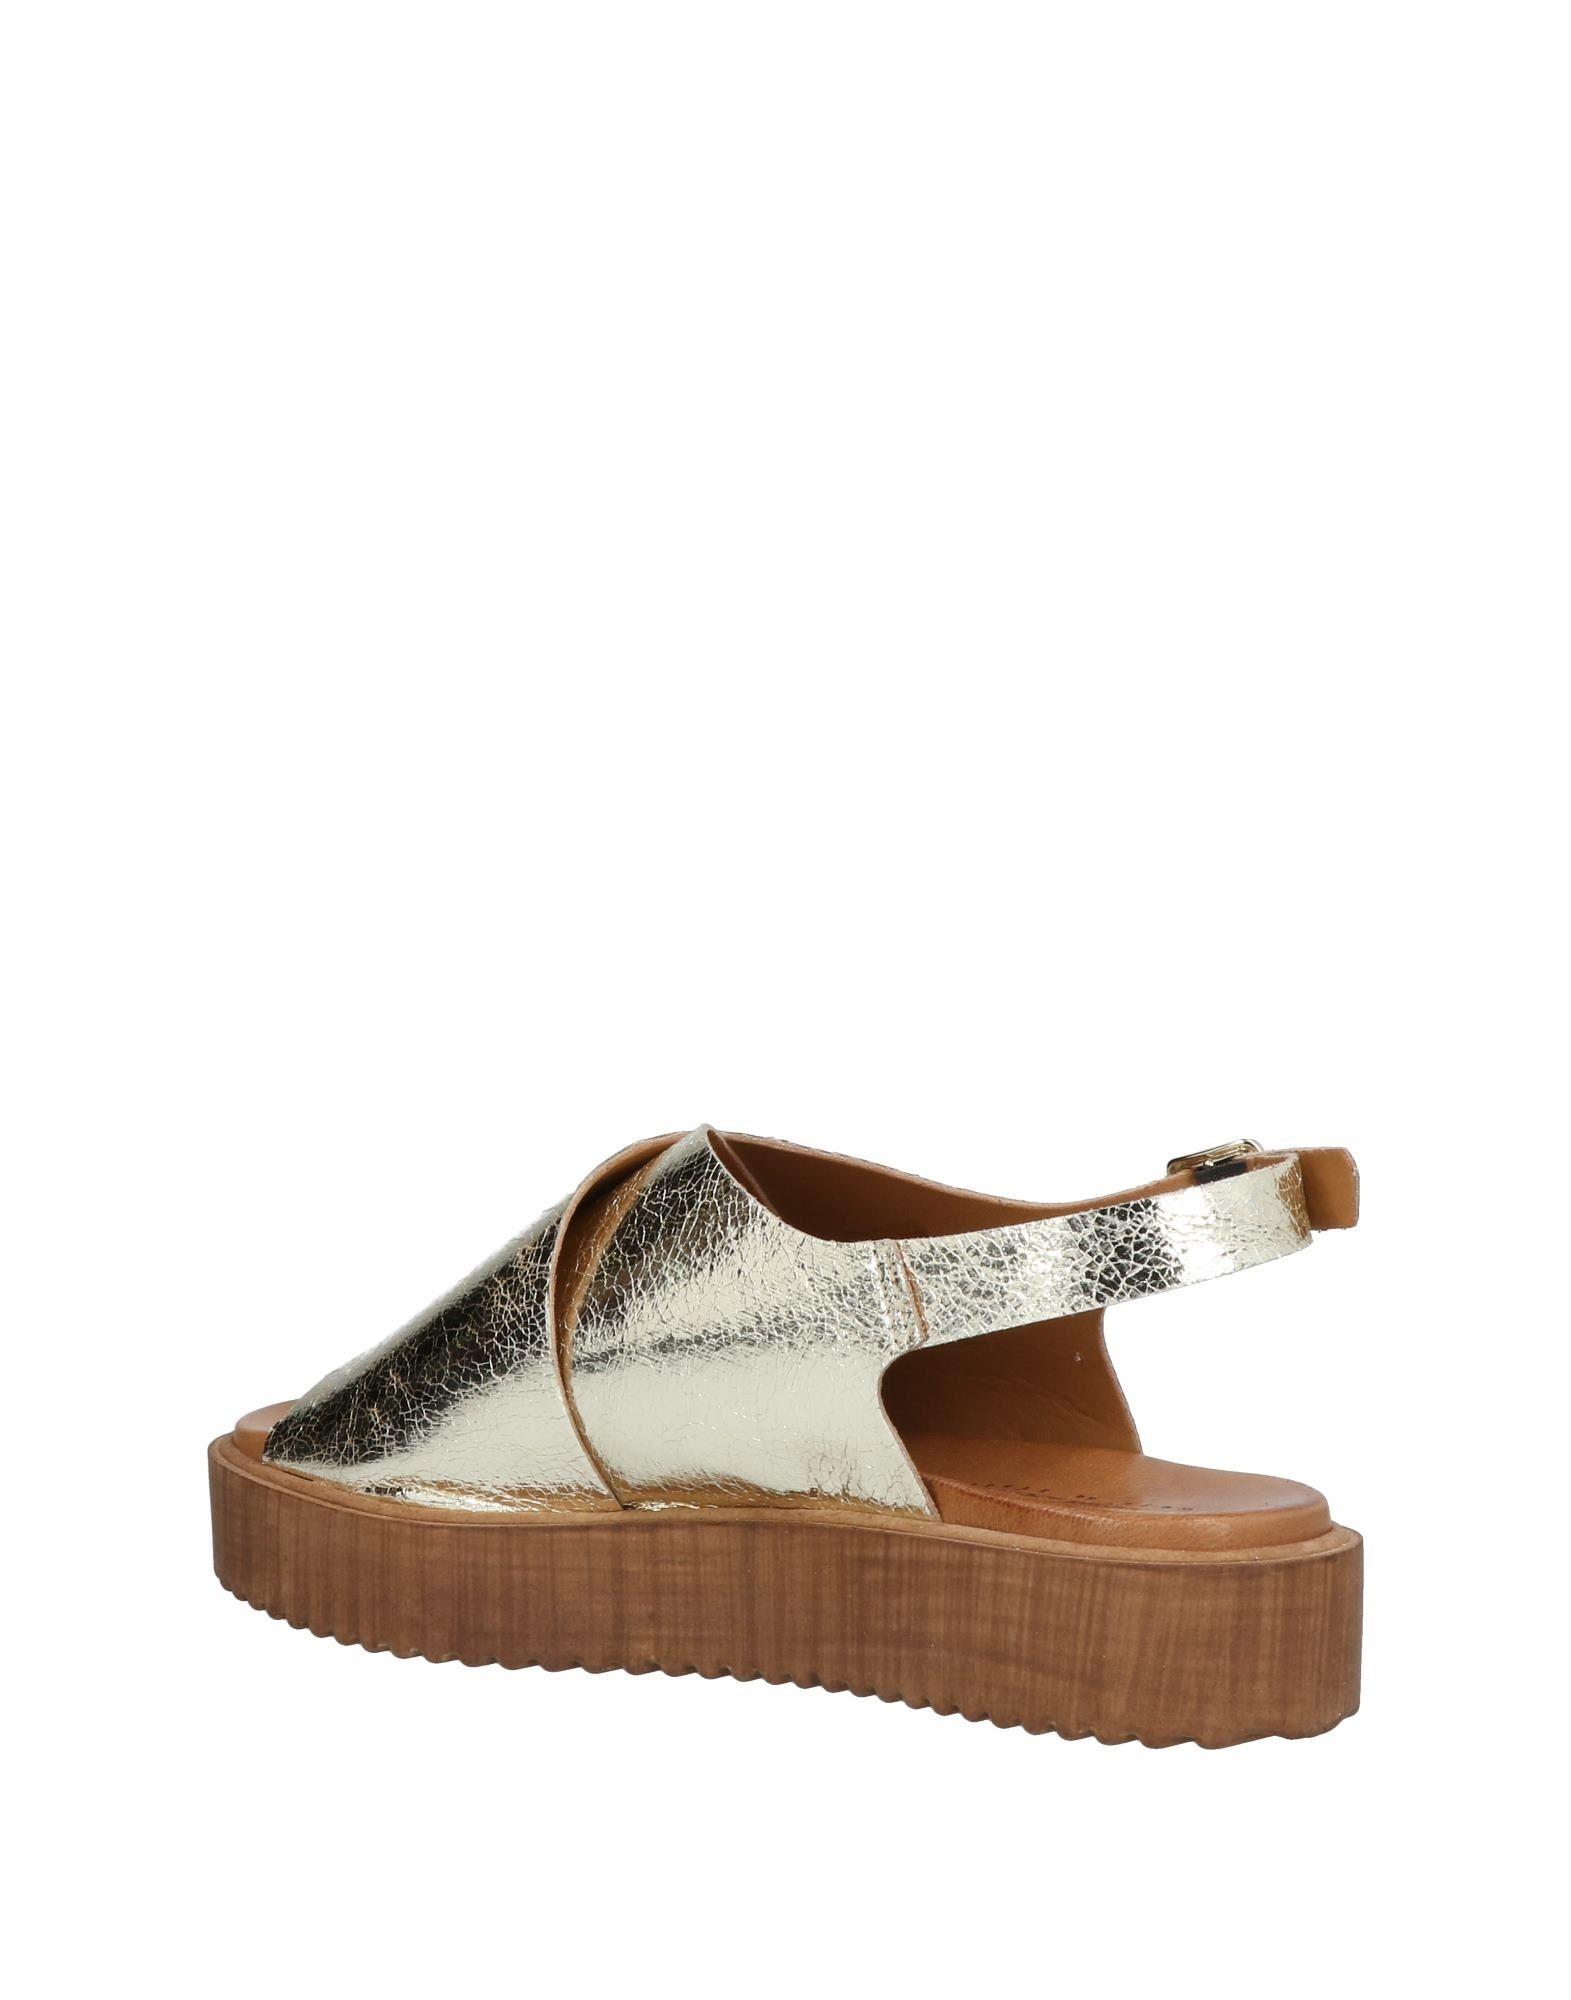 Sandales Bottega Artigiana Femme - Sandales Bottega Artigiana sur